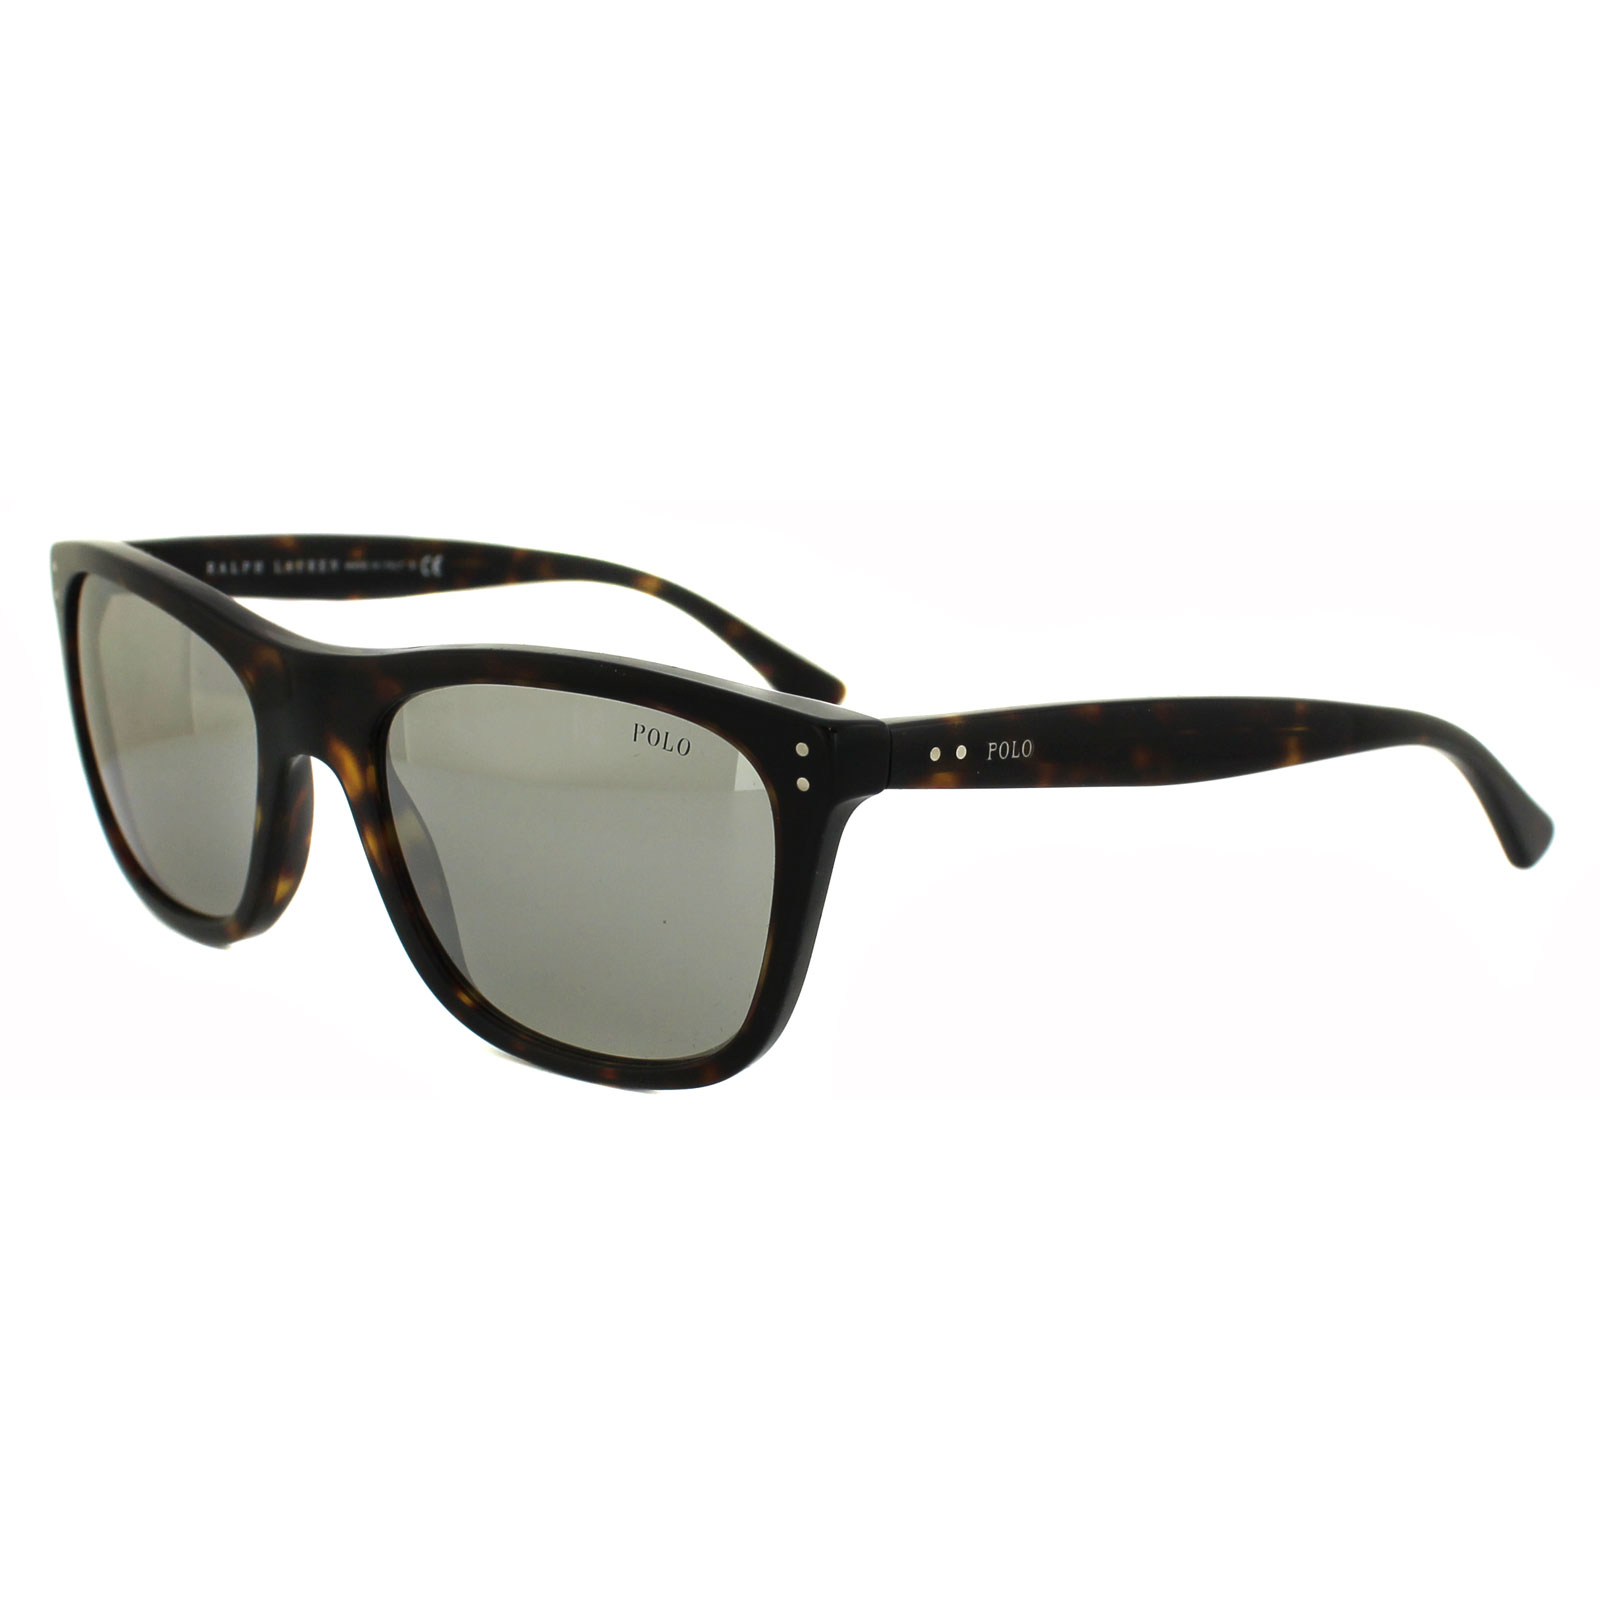 Polo Ralph Lauren Sunglasses 4071 50036G Tortoise Grey 8053672219012 ...